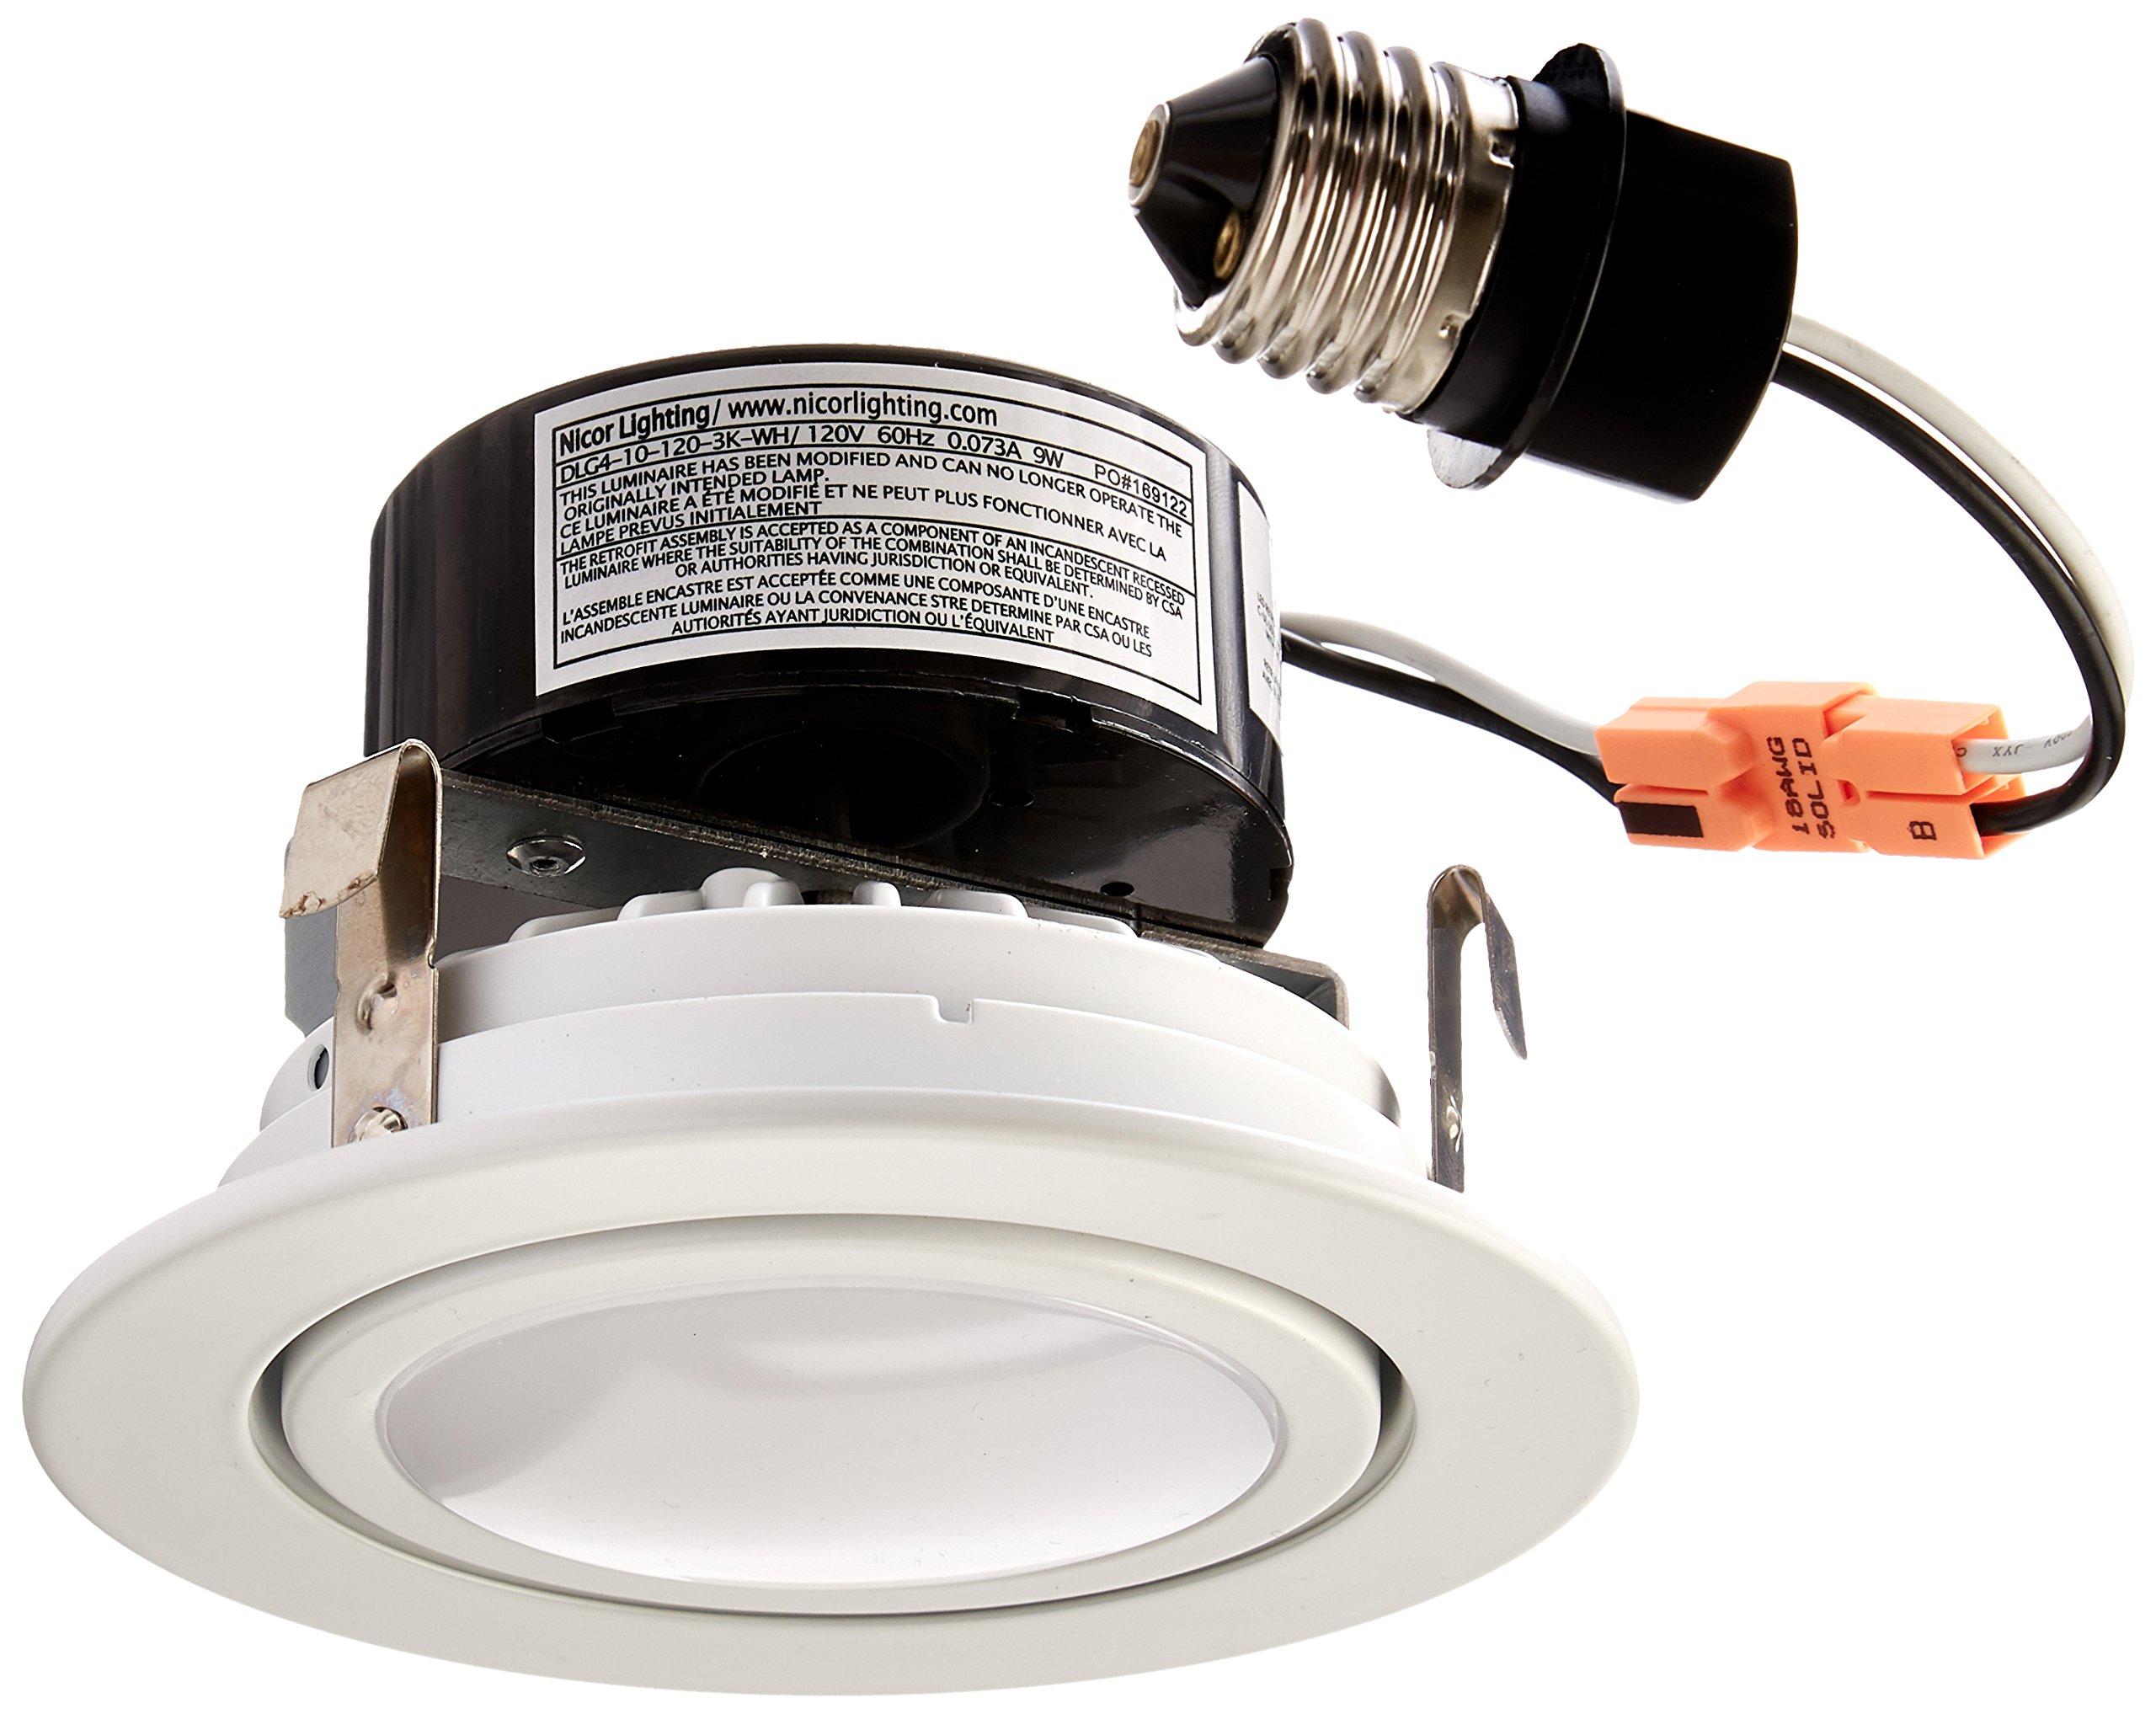 NICOR Lighting 4-Inch Dimmable 3000K LED Gimbal Recessed Downlight, White (DLG4-10-120-3K-WH)